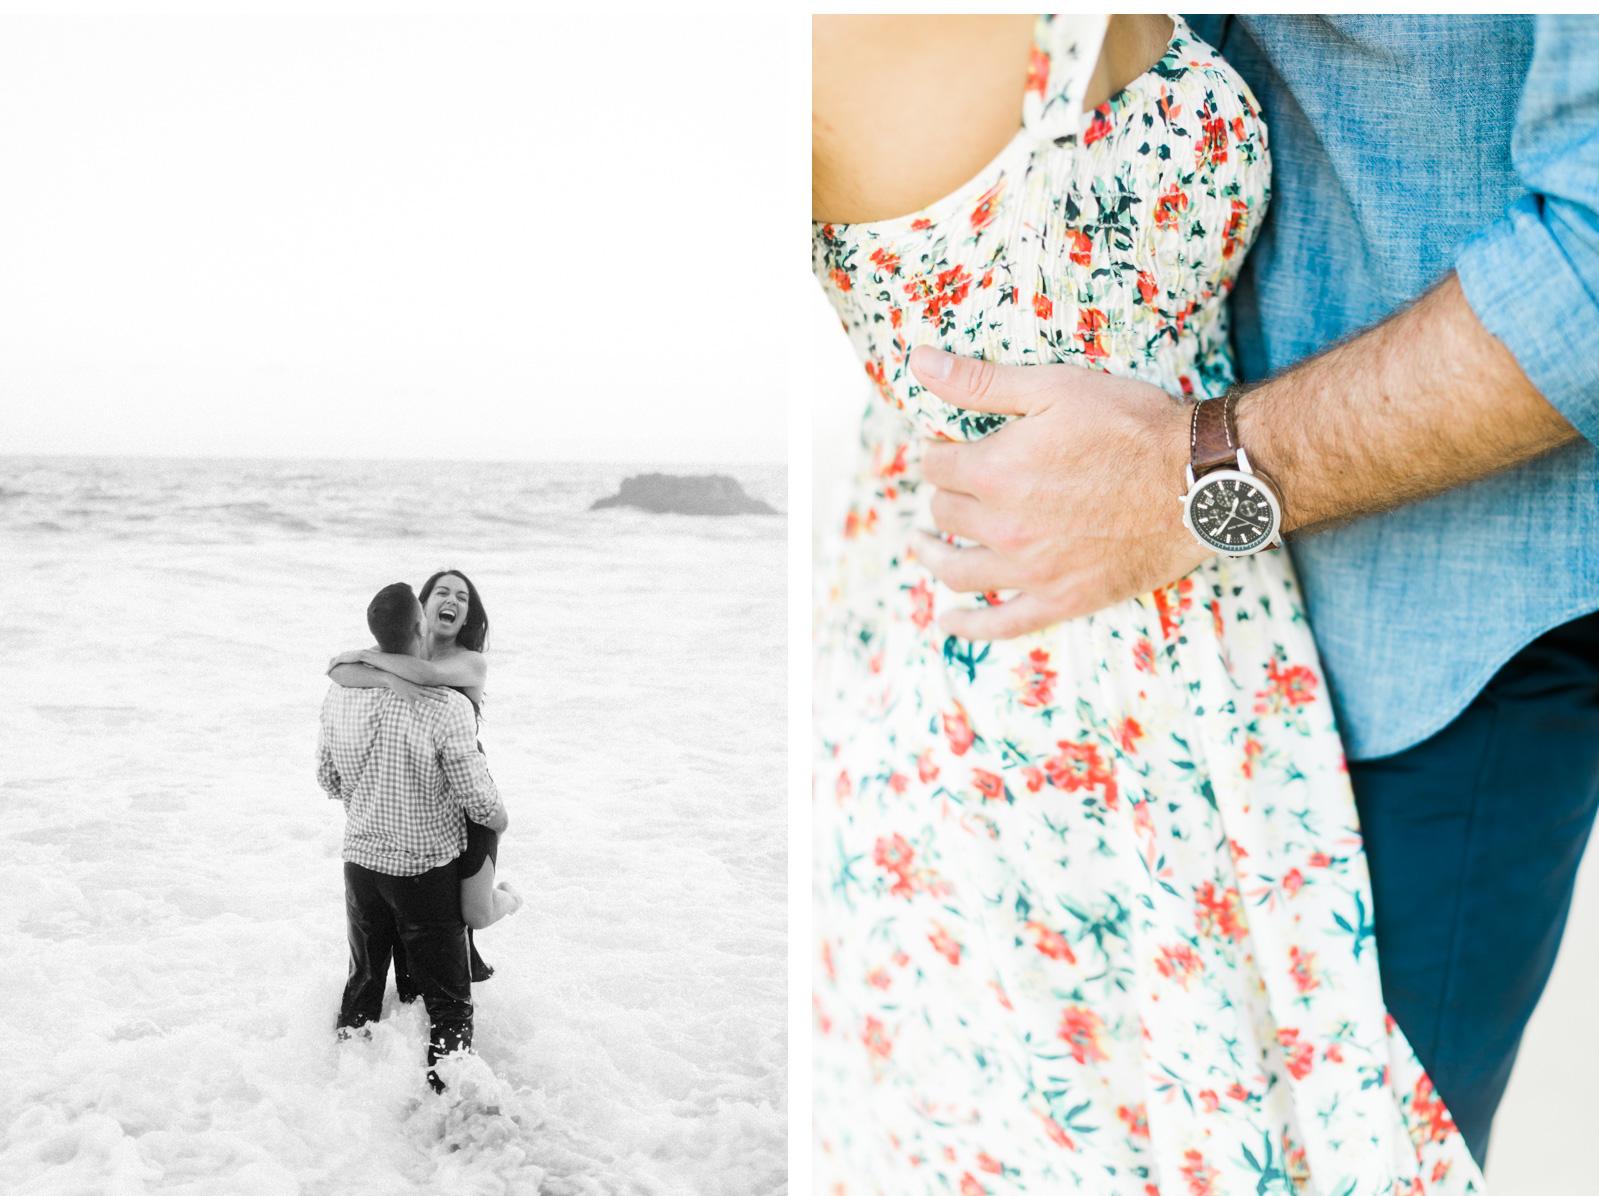 Surf-Board-Engagement-Session-Natalie-Schutt-Photography-Laguna-Beach_03.jpg